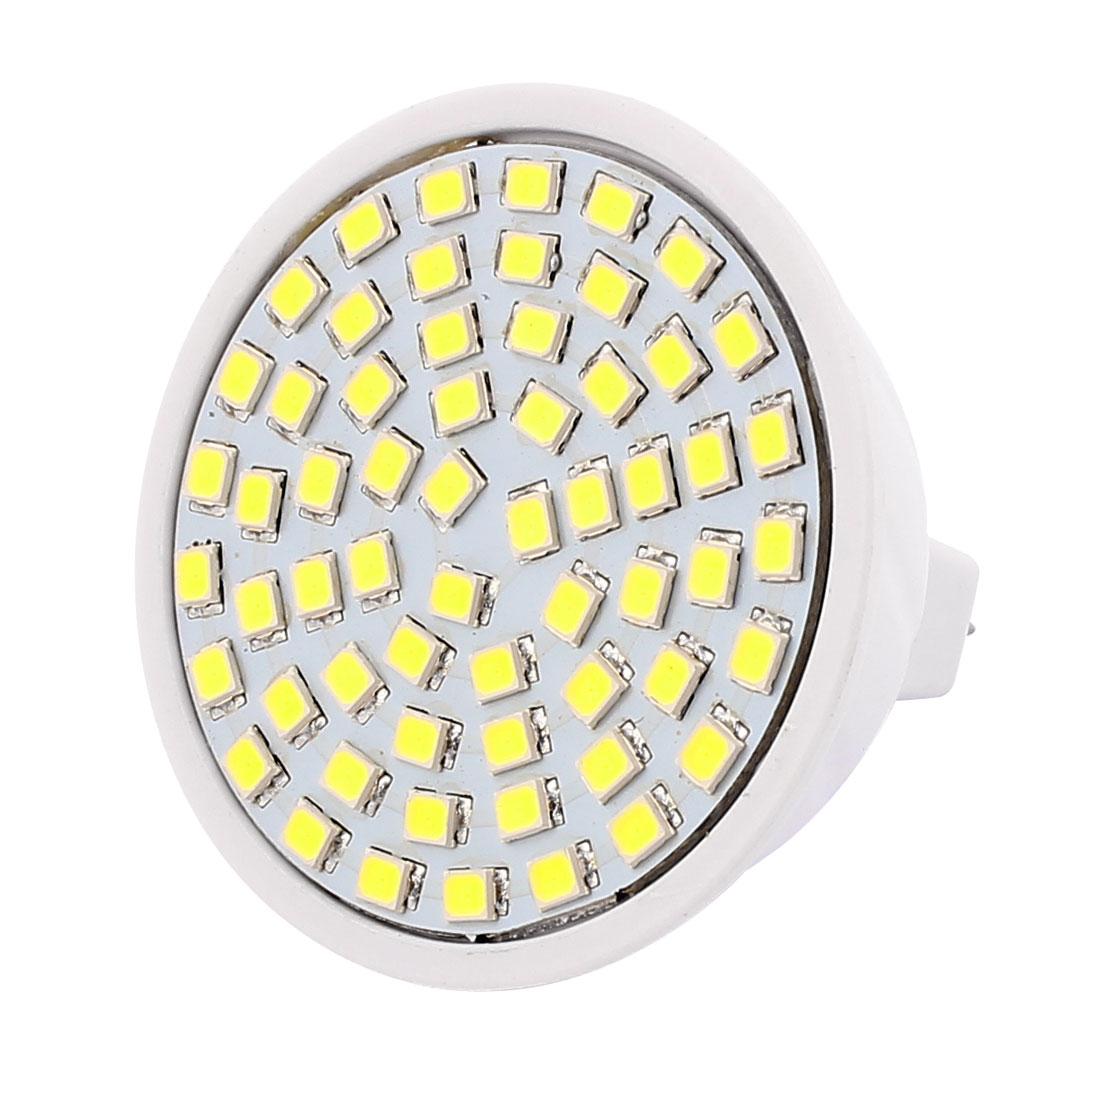 MR16 SMD 2835 60 LEDs 6W Plastic Energy-Saving LED Lamp Bulb White AC 220V